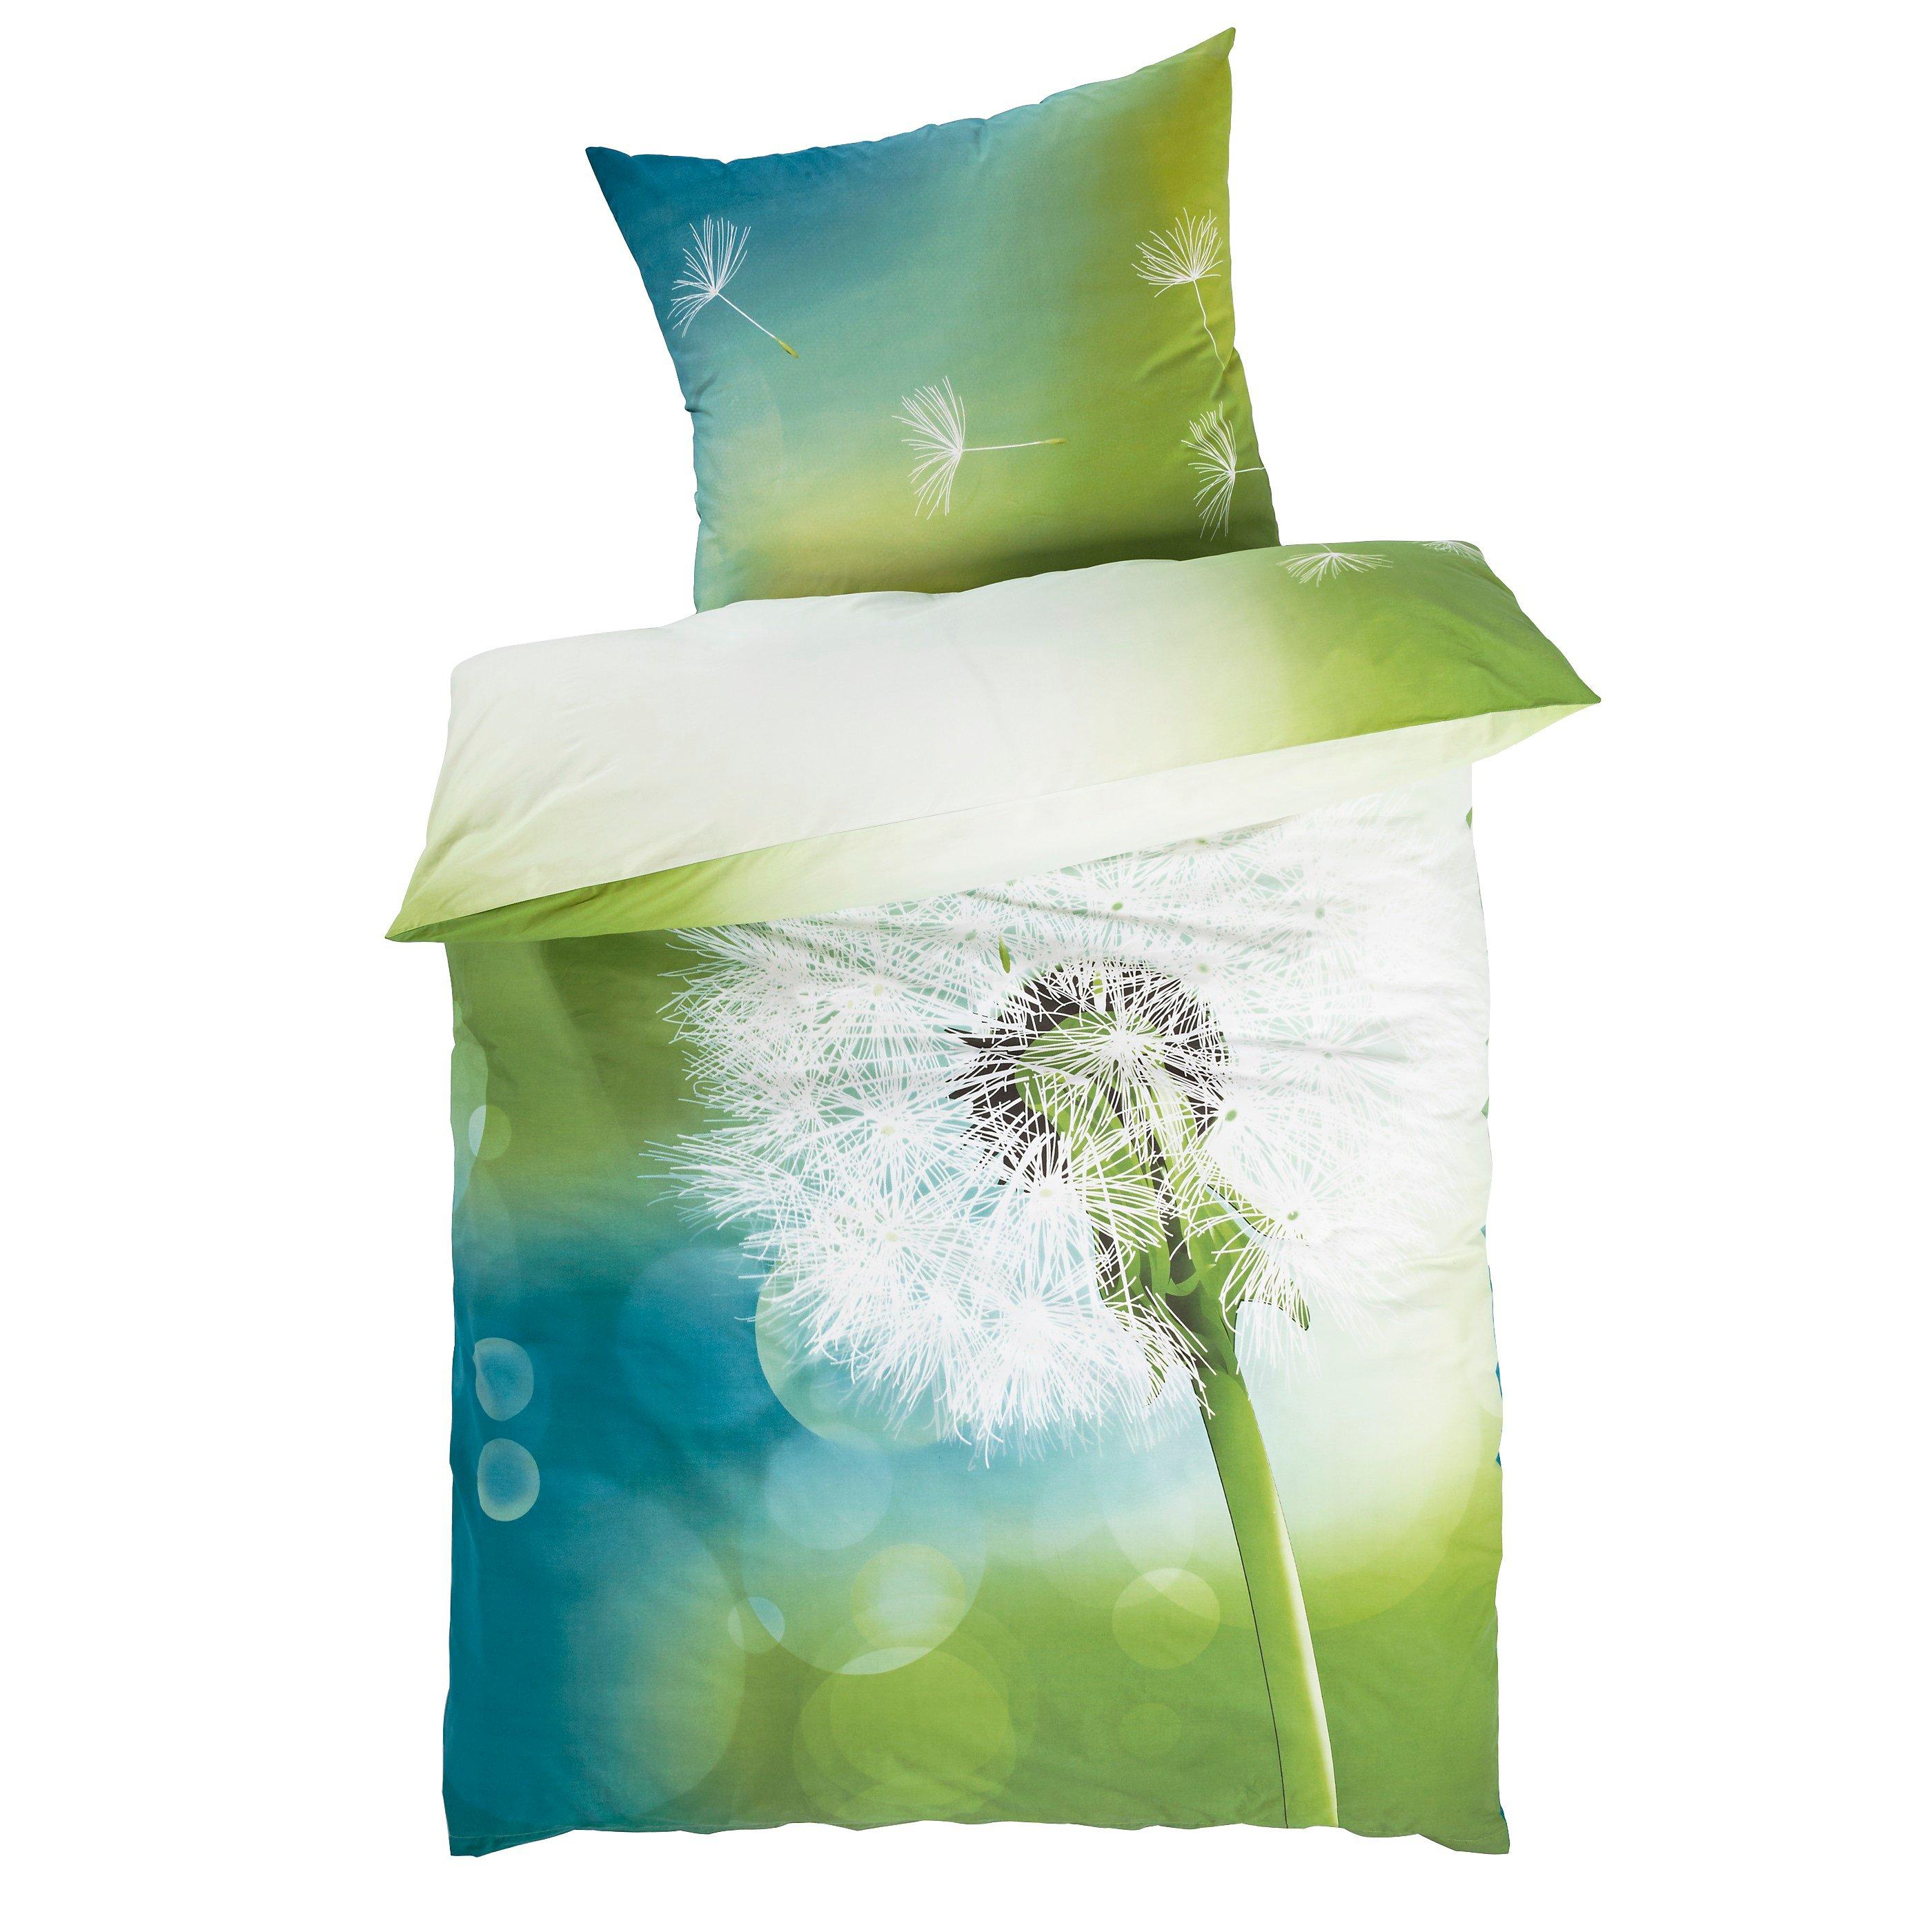 bettw sche pusteblume 155 x 220 cm bestellen. Black Bedroom Furniture Sets. Home Design Ideas